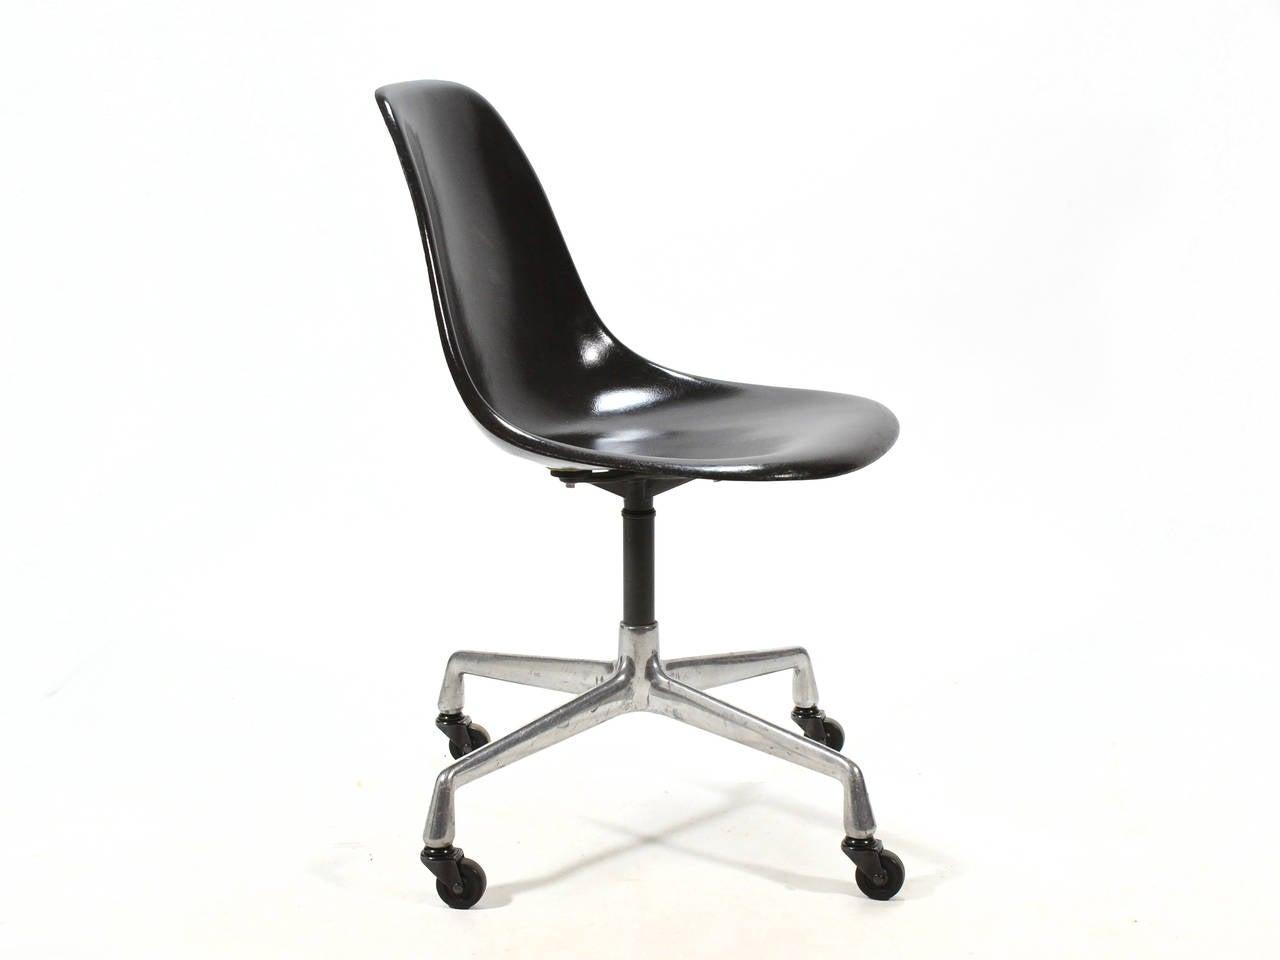 eames psc fiberglass side chairs by herman miller set of 12 or more for sale at 1stdibs. Black Bedroom Furniture Sets. Home Design Ideas